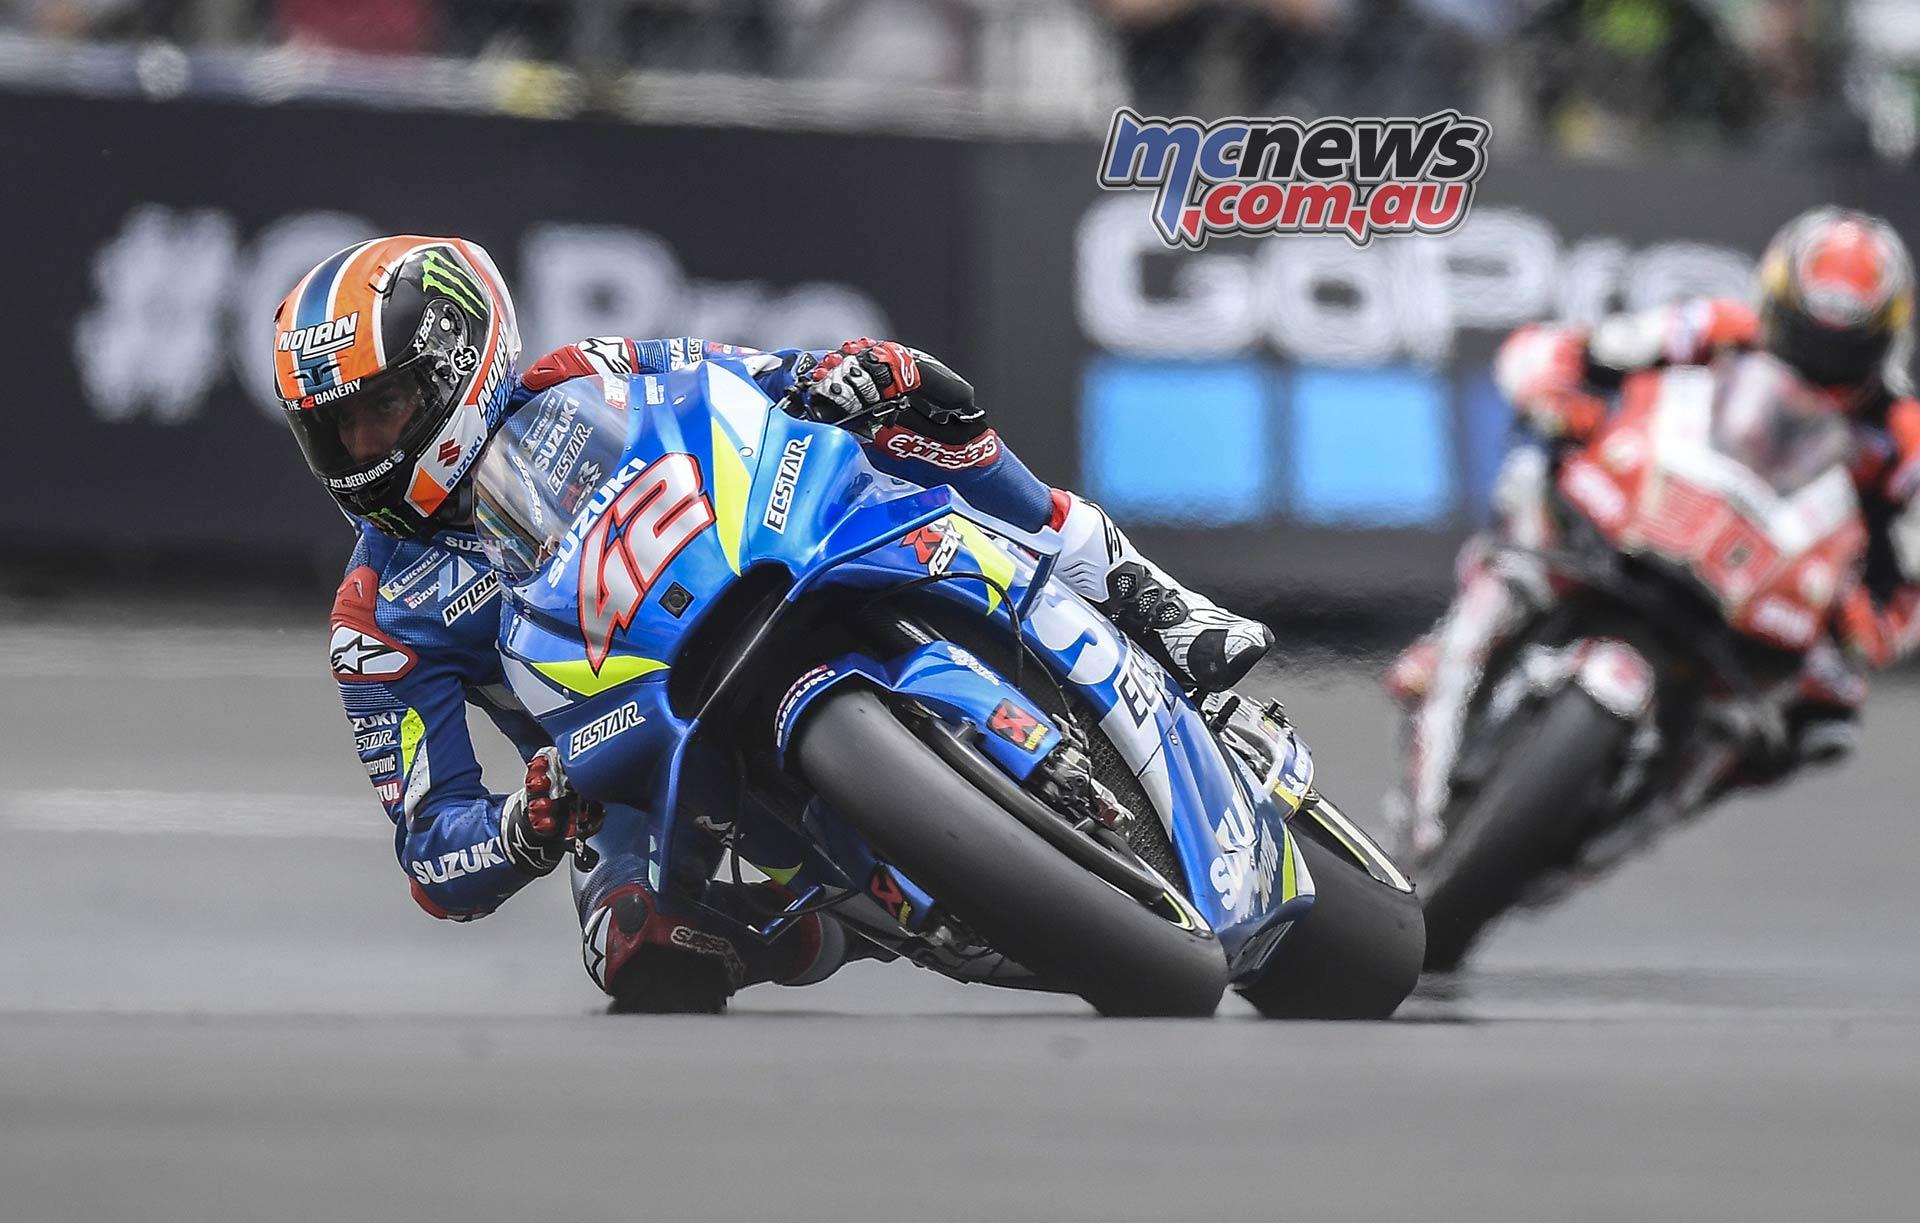 MotoGP Rnd LeMans Fri Rins